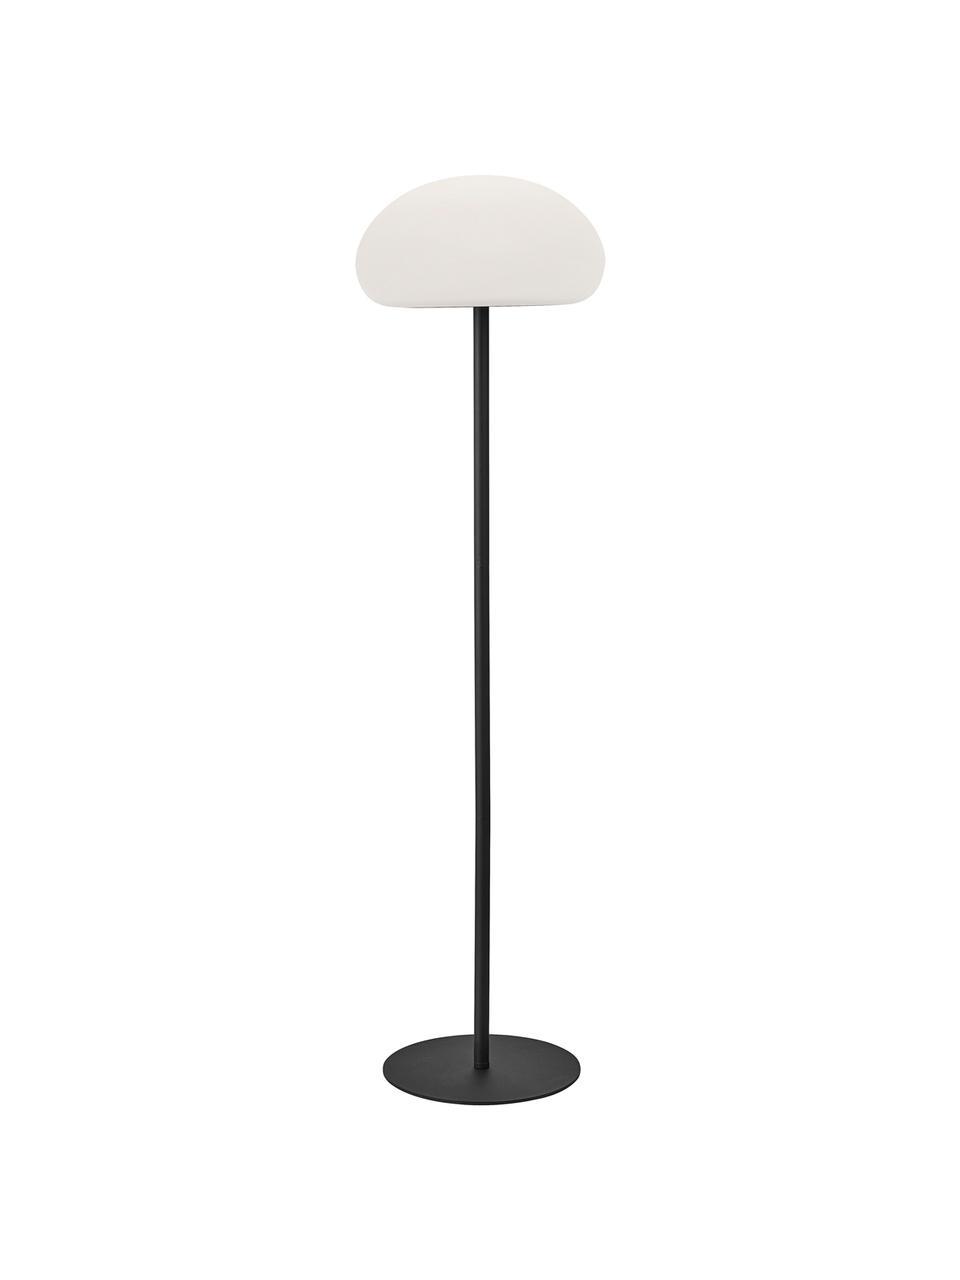 Mobile Dimmbare Outdoor Stehlampe Sponge, Lampenfuß: Kunststoff, Lampenschirm: Kunststoff, Weiß, Schwarz, Ø 34 x H 126 cm